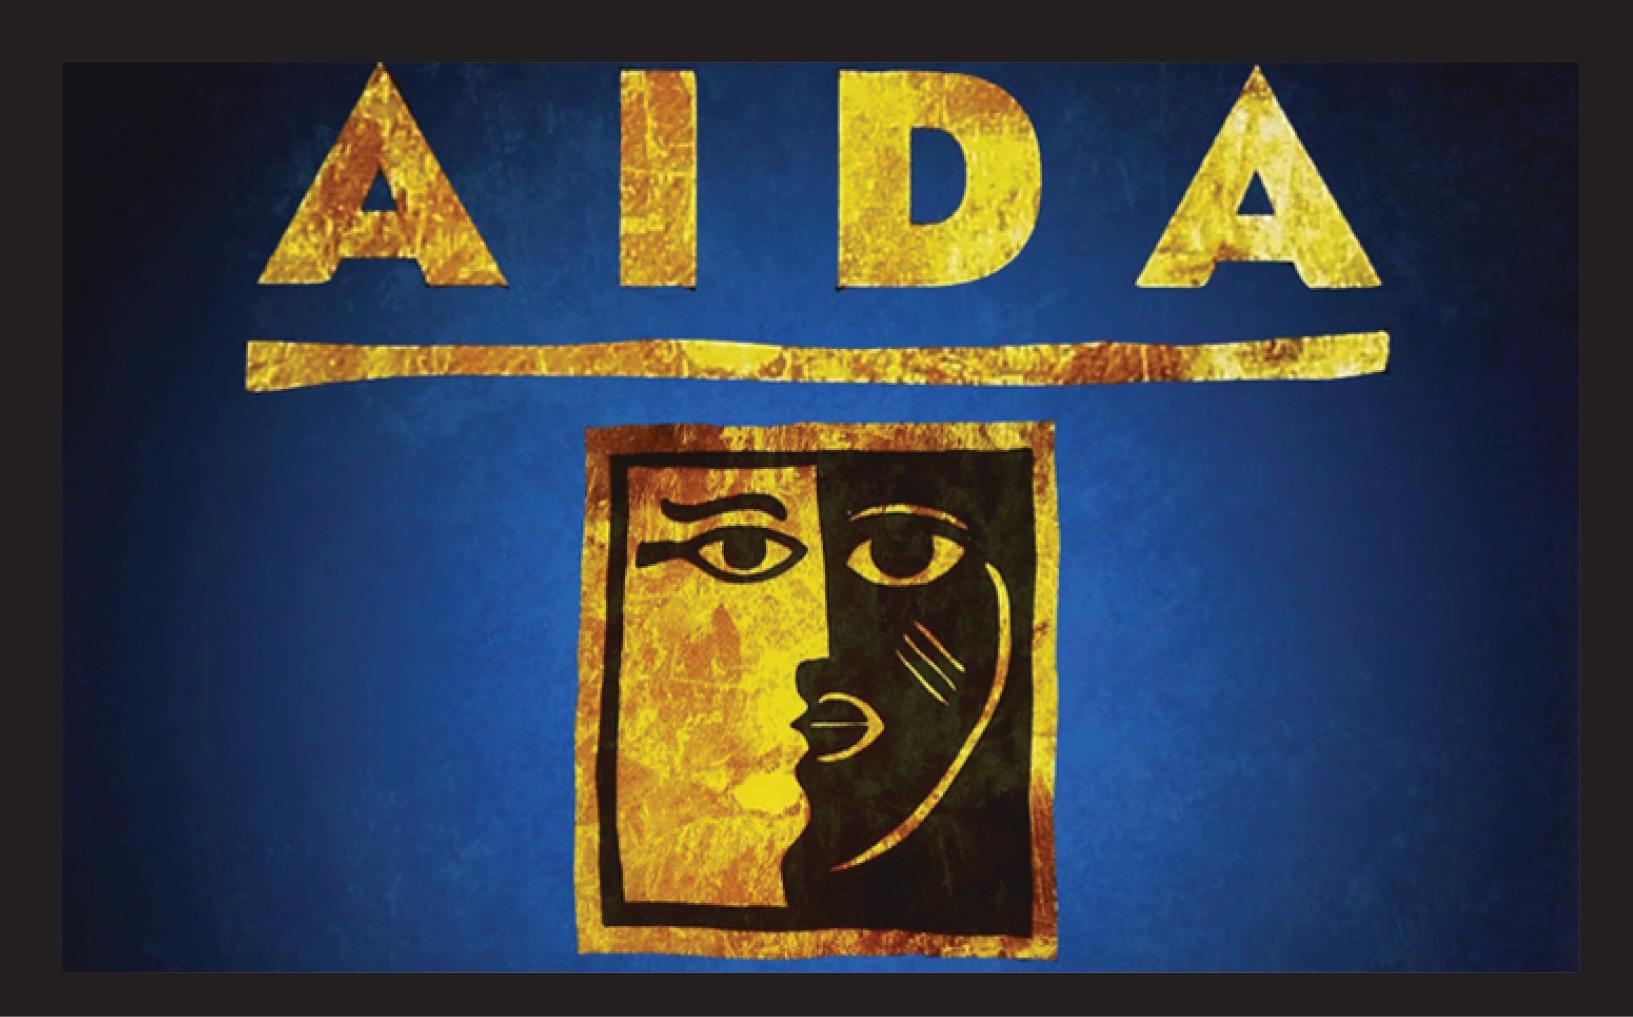 Aida, original Broadway production